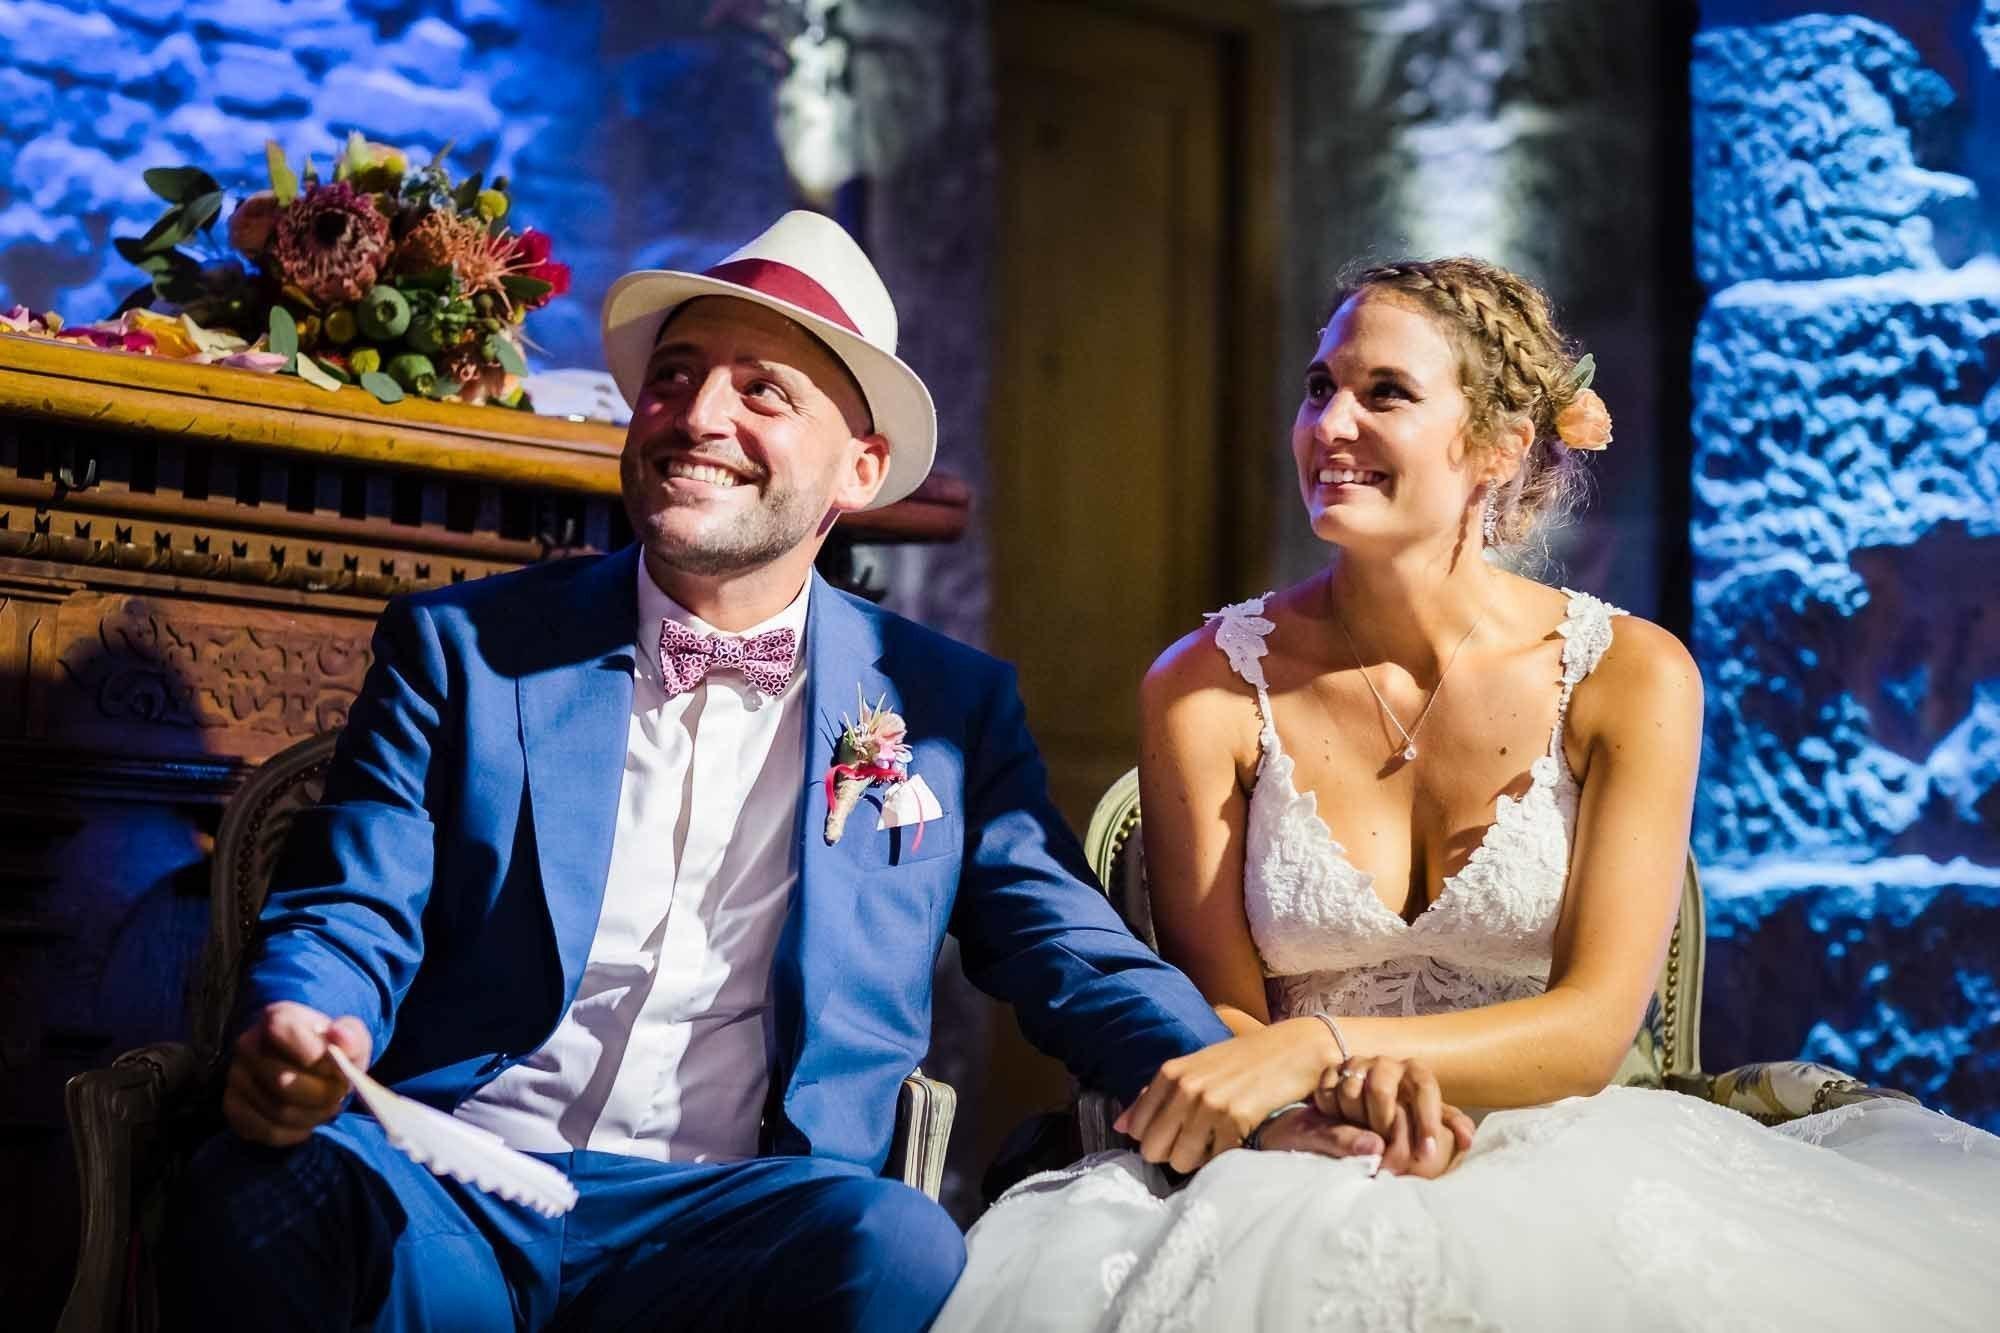 Brautpaar lacht